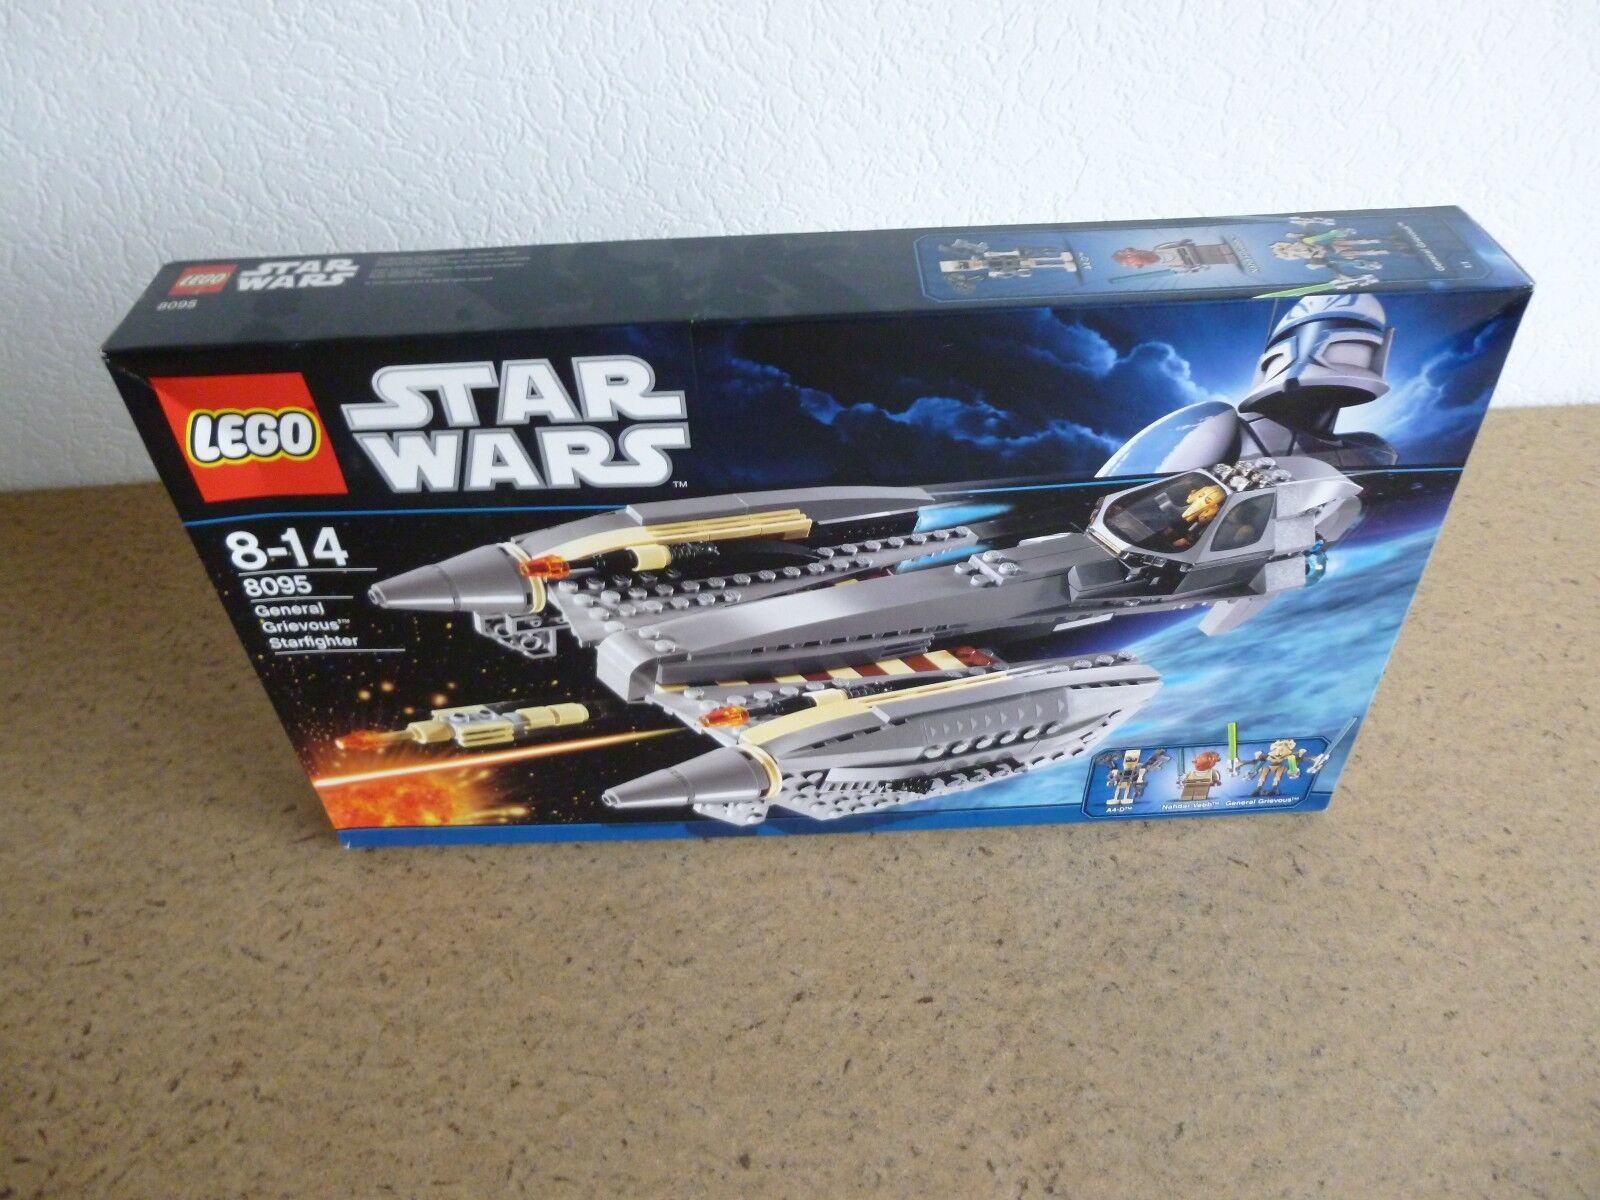 LEGO StarWars General Grievous' Starfighter (8095) OVP